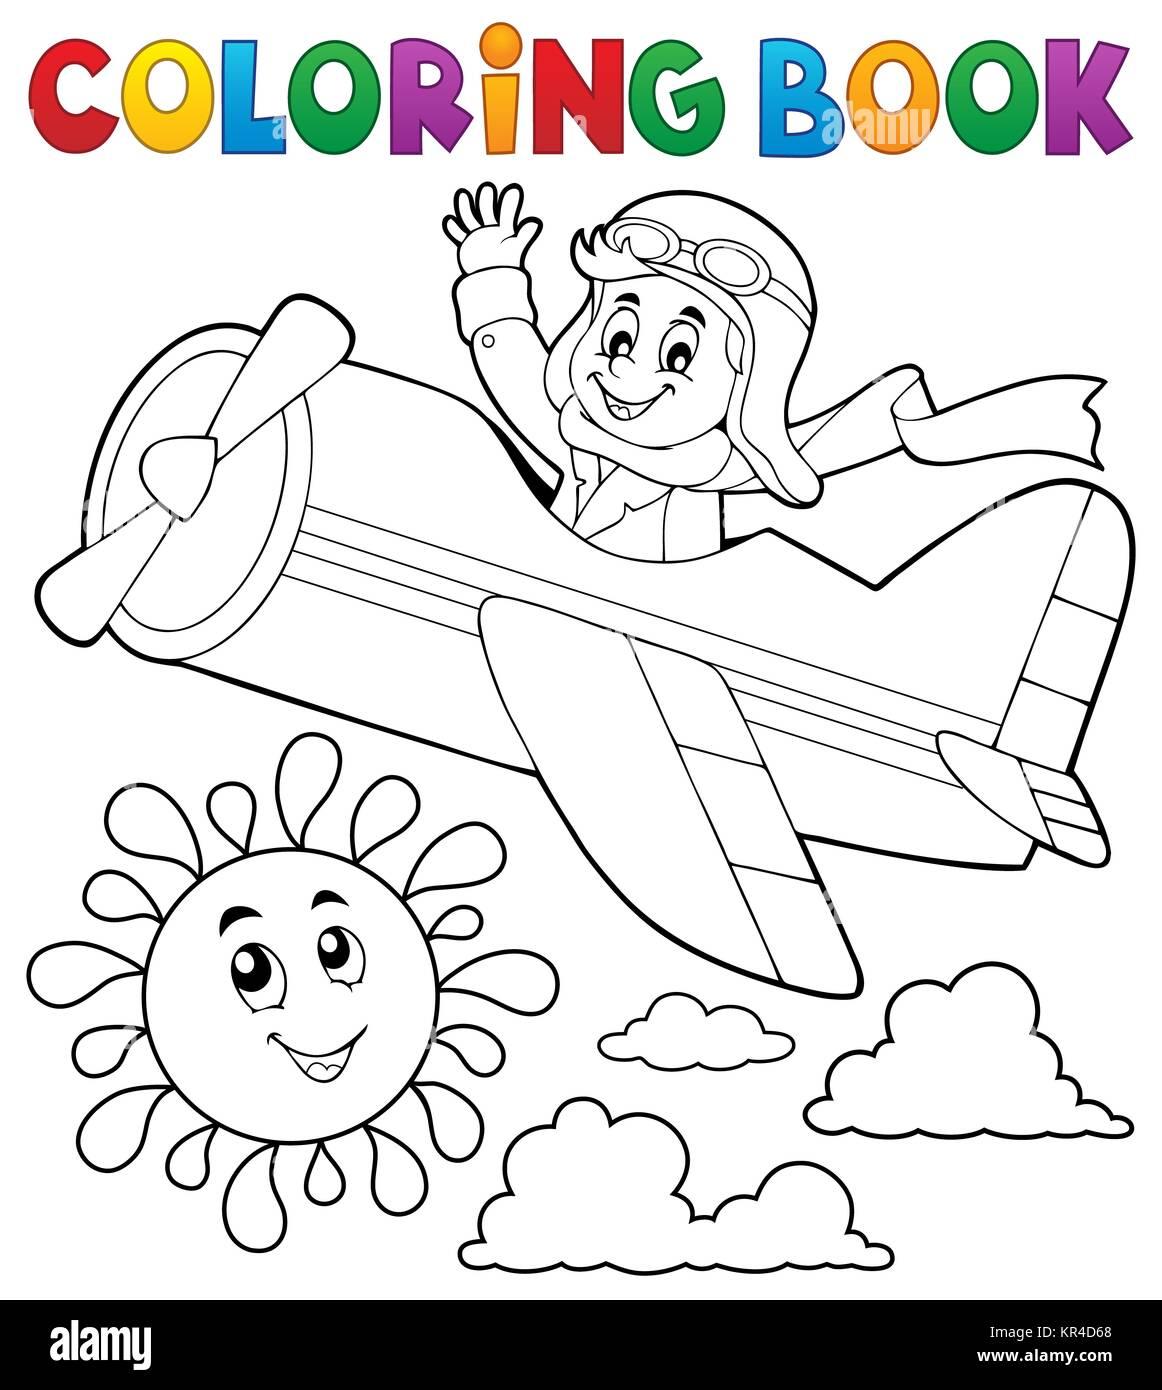 Pilot Book Imágenes De Stock & Pilot Book Fotos De Stock - Alamy